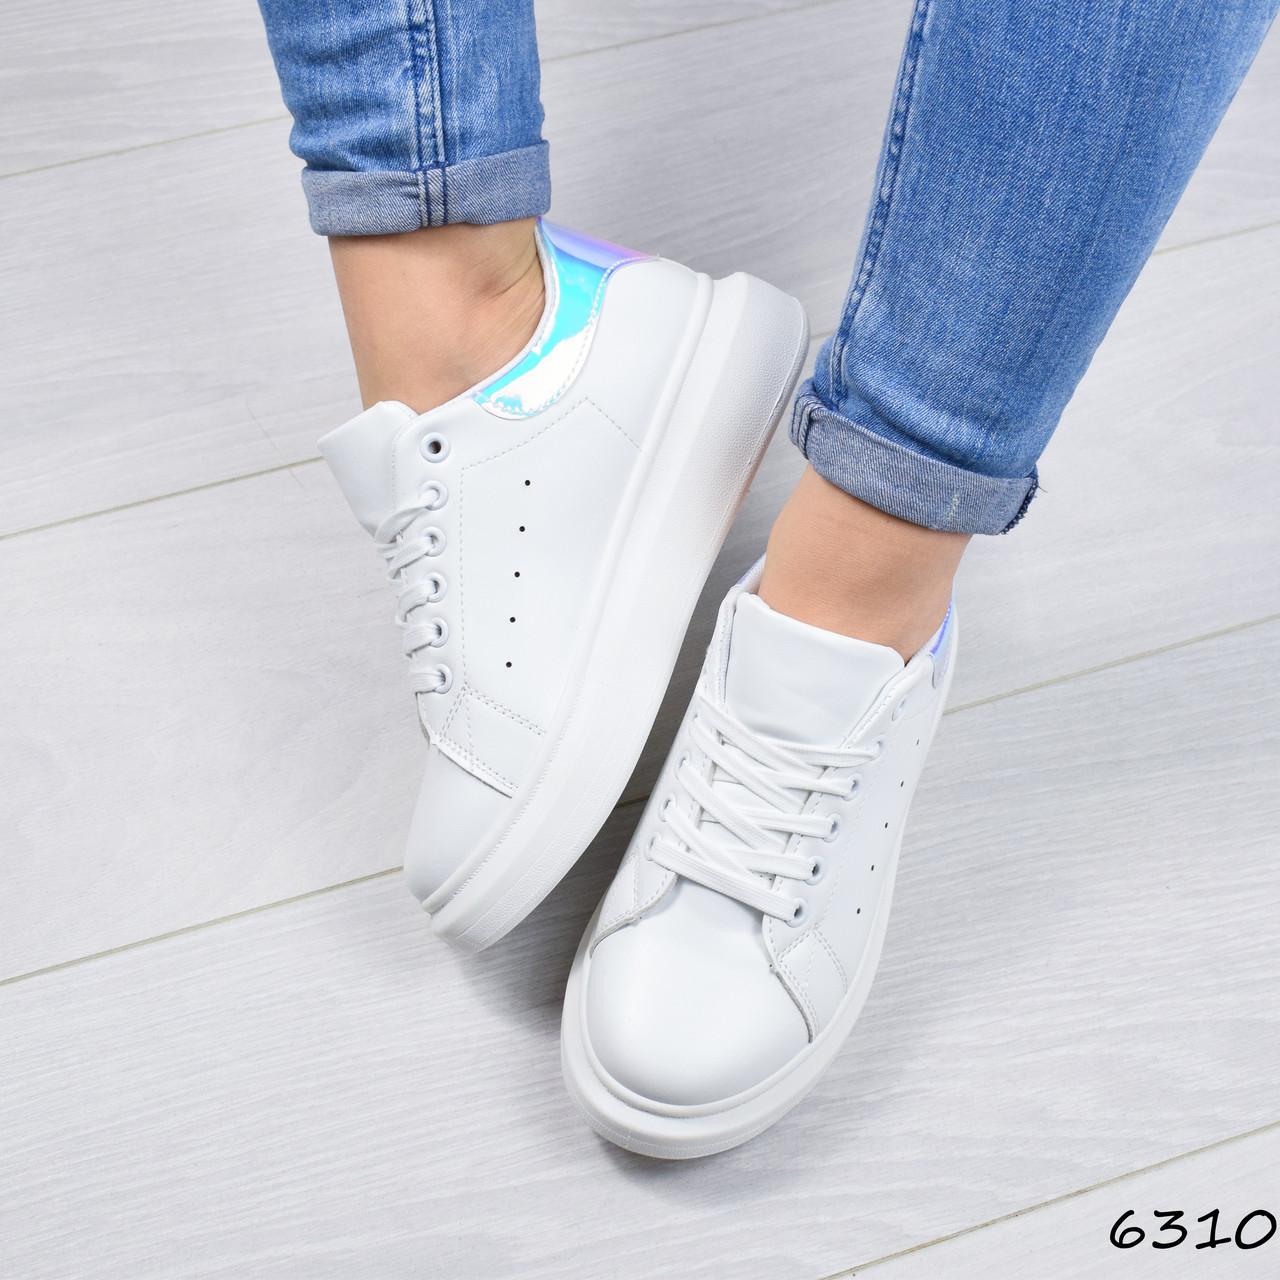 6b2c5b4b Кроссовки женские Fresh белый + мульти 6310, спортивная обувь, цена 485  грн., купить в Днепре — Prom.ua (ID#859432295)